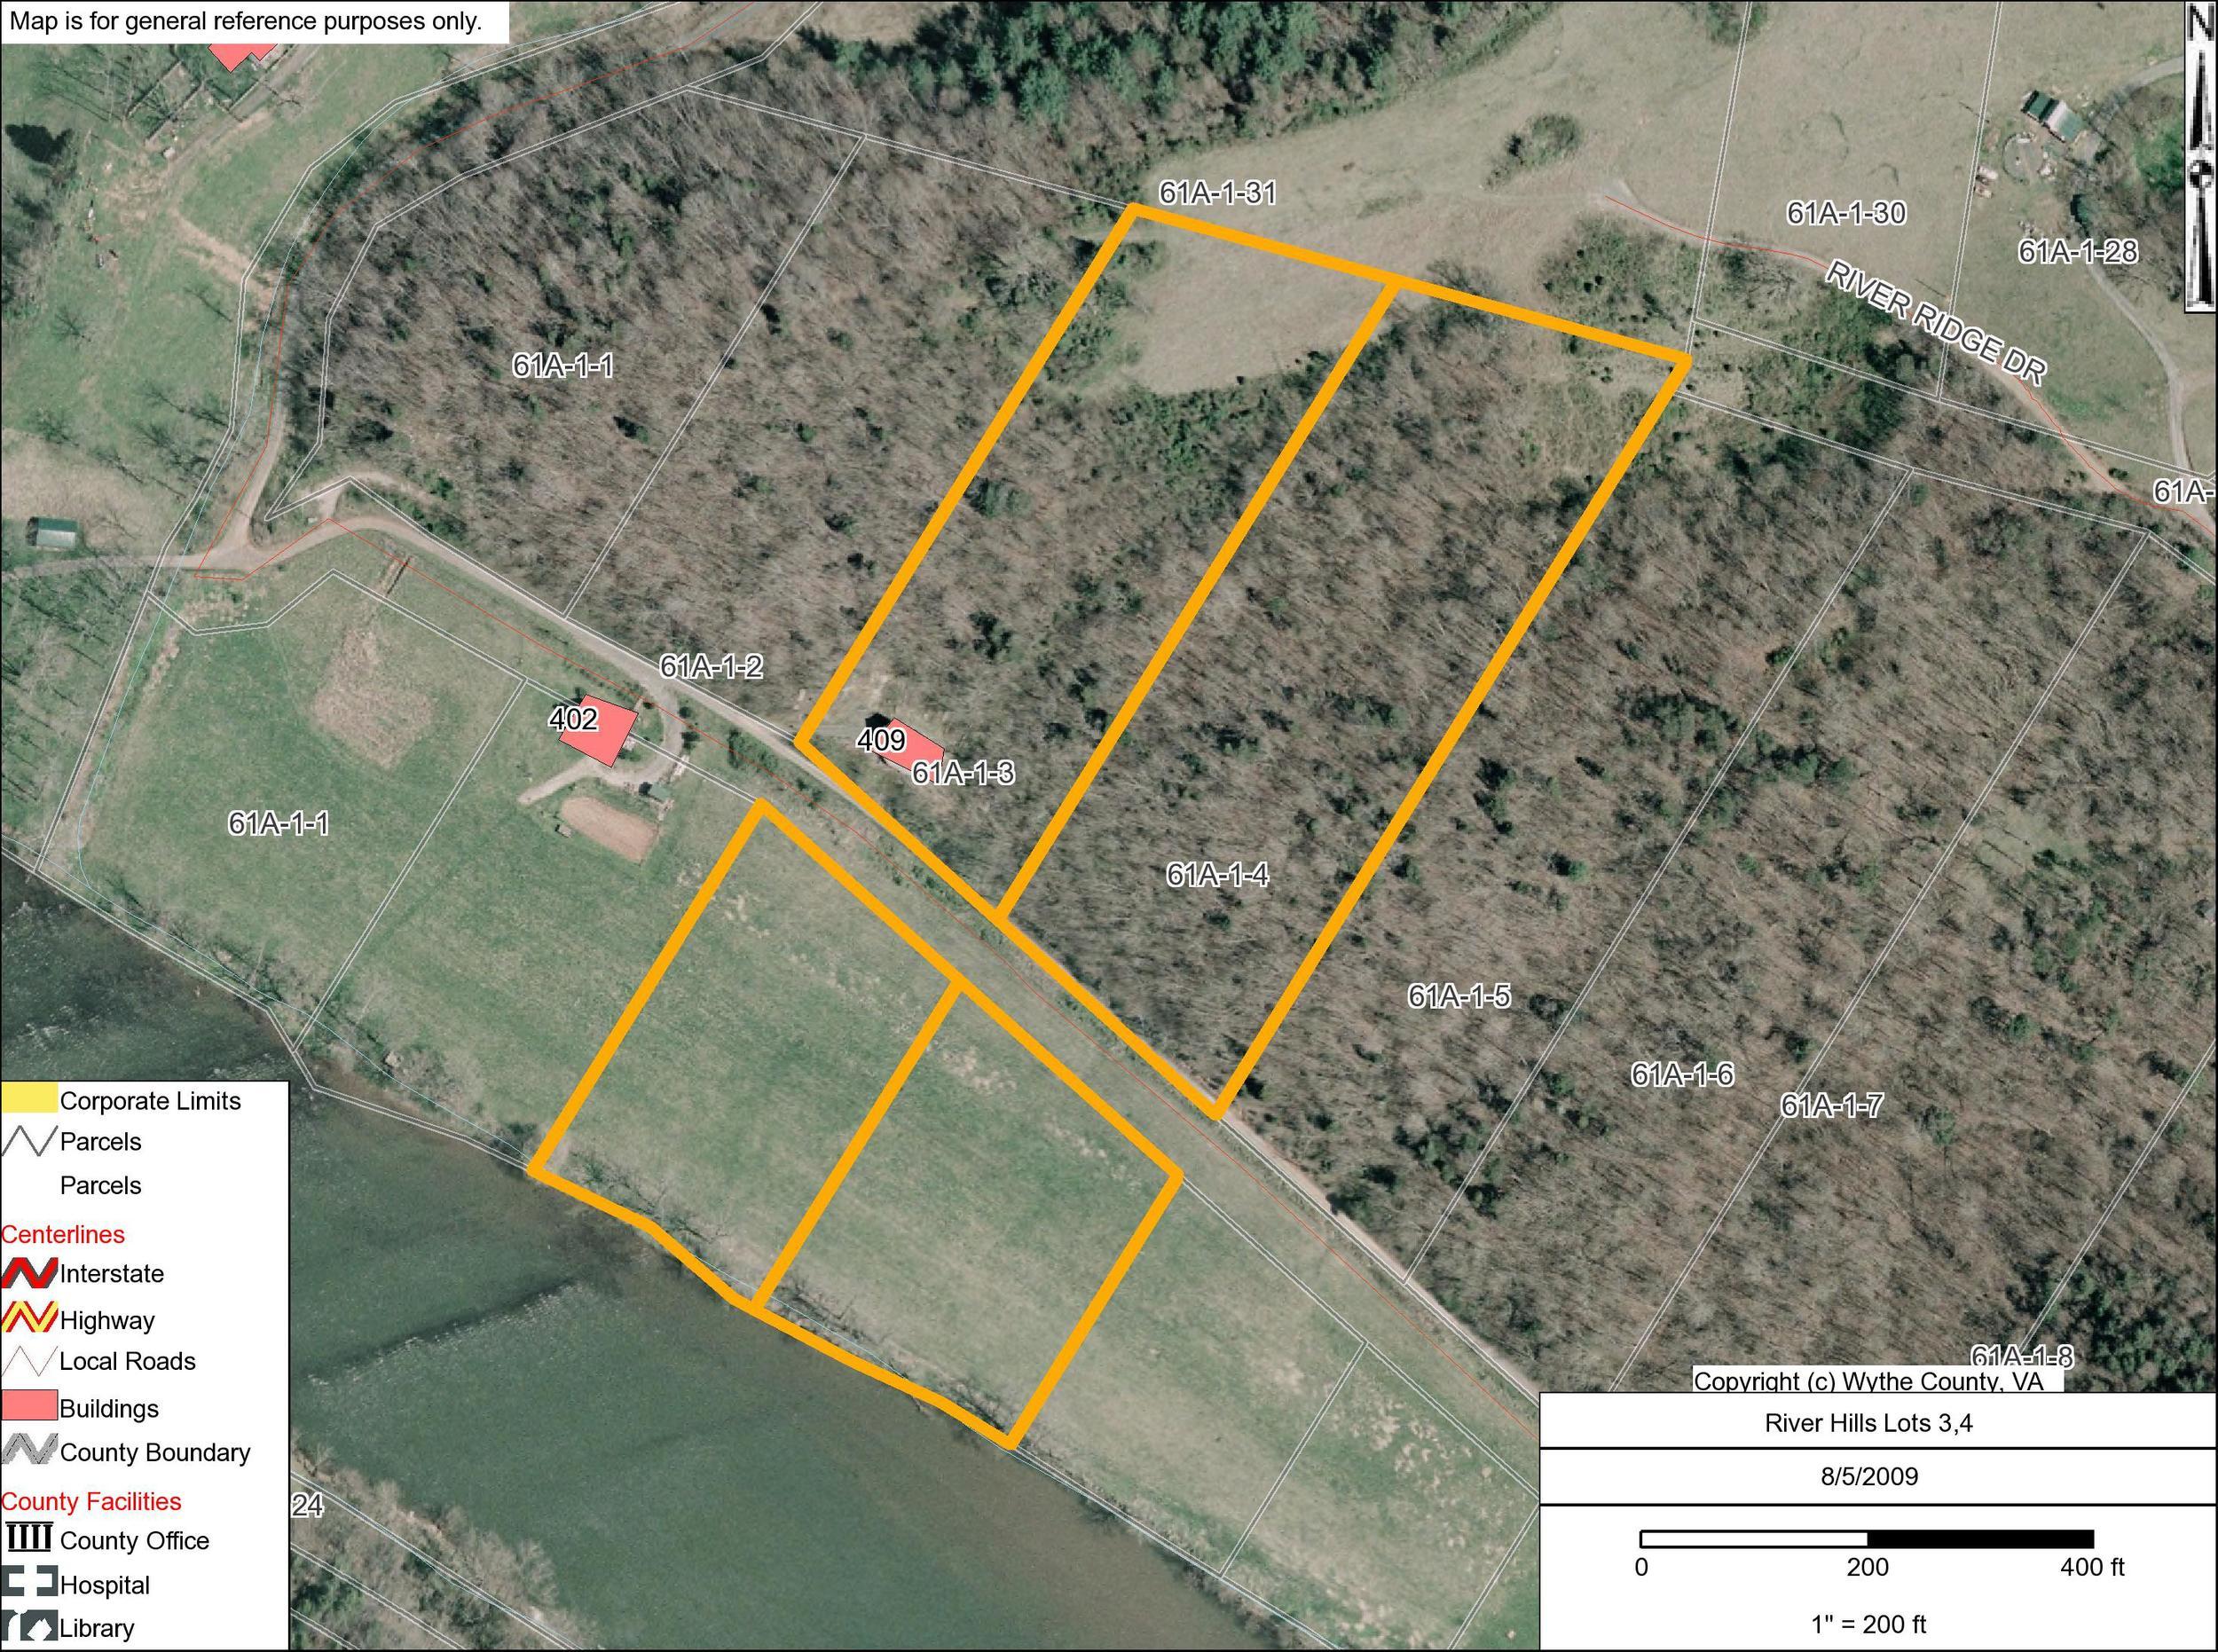 Lot 3-4 Aerial Photo.jpg